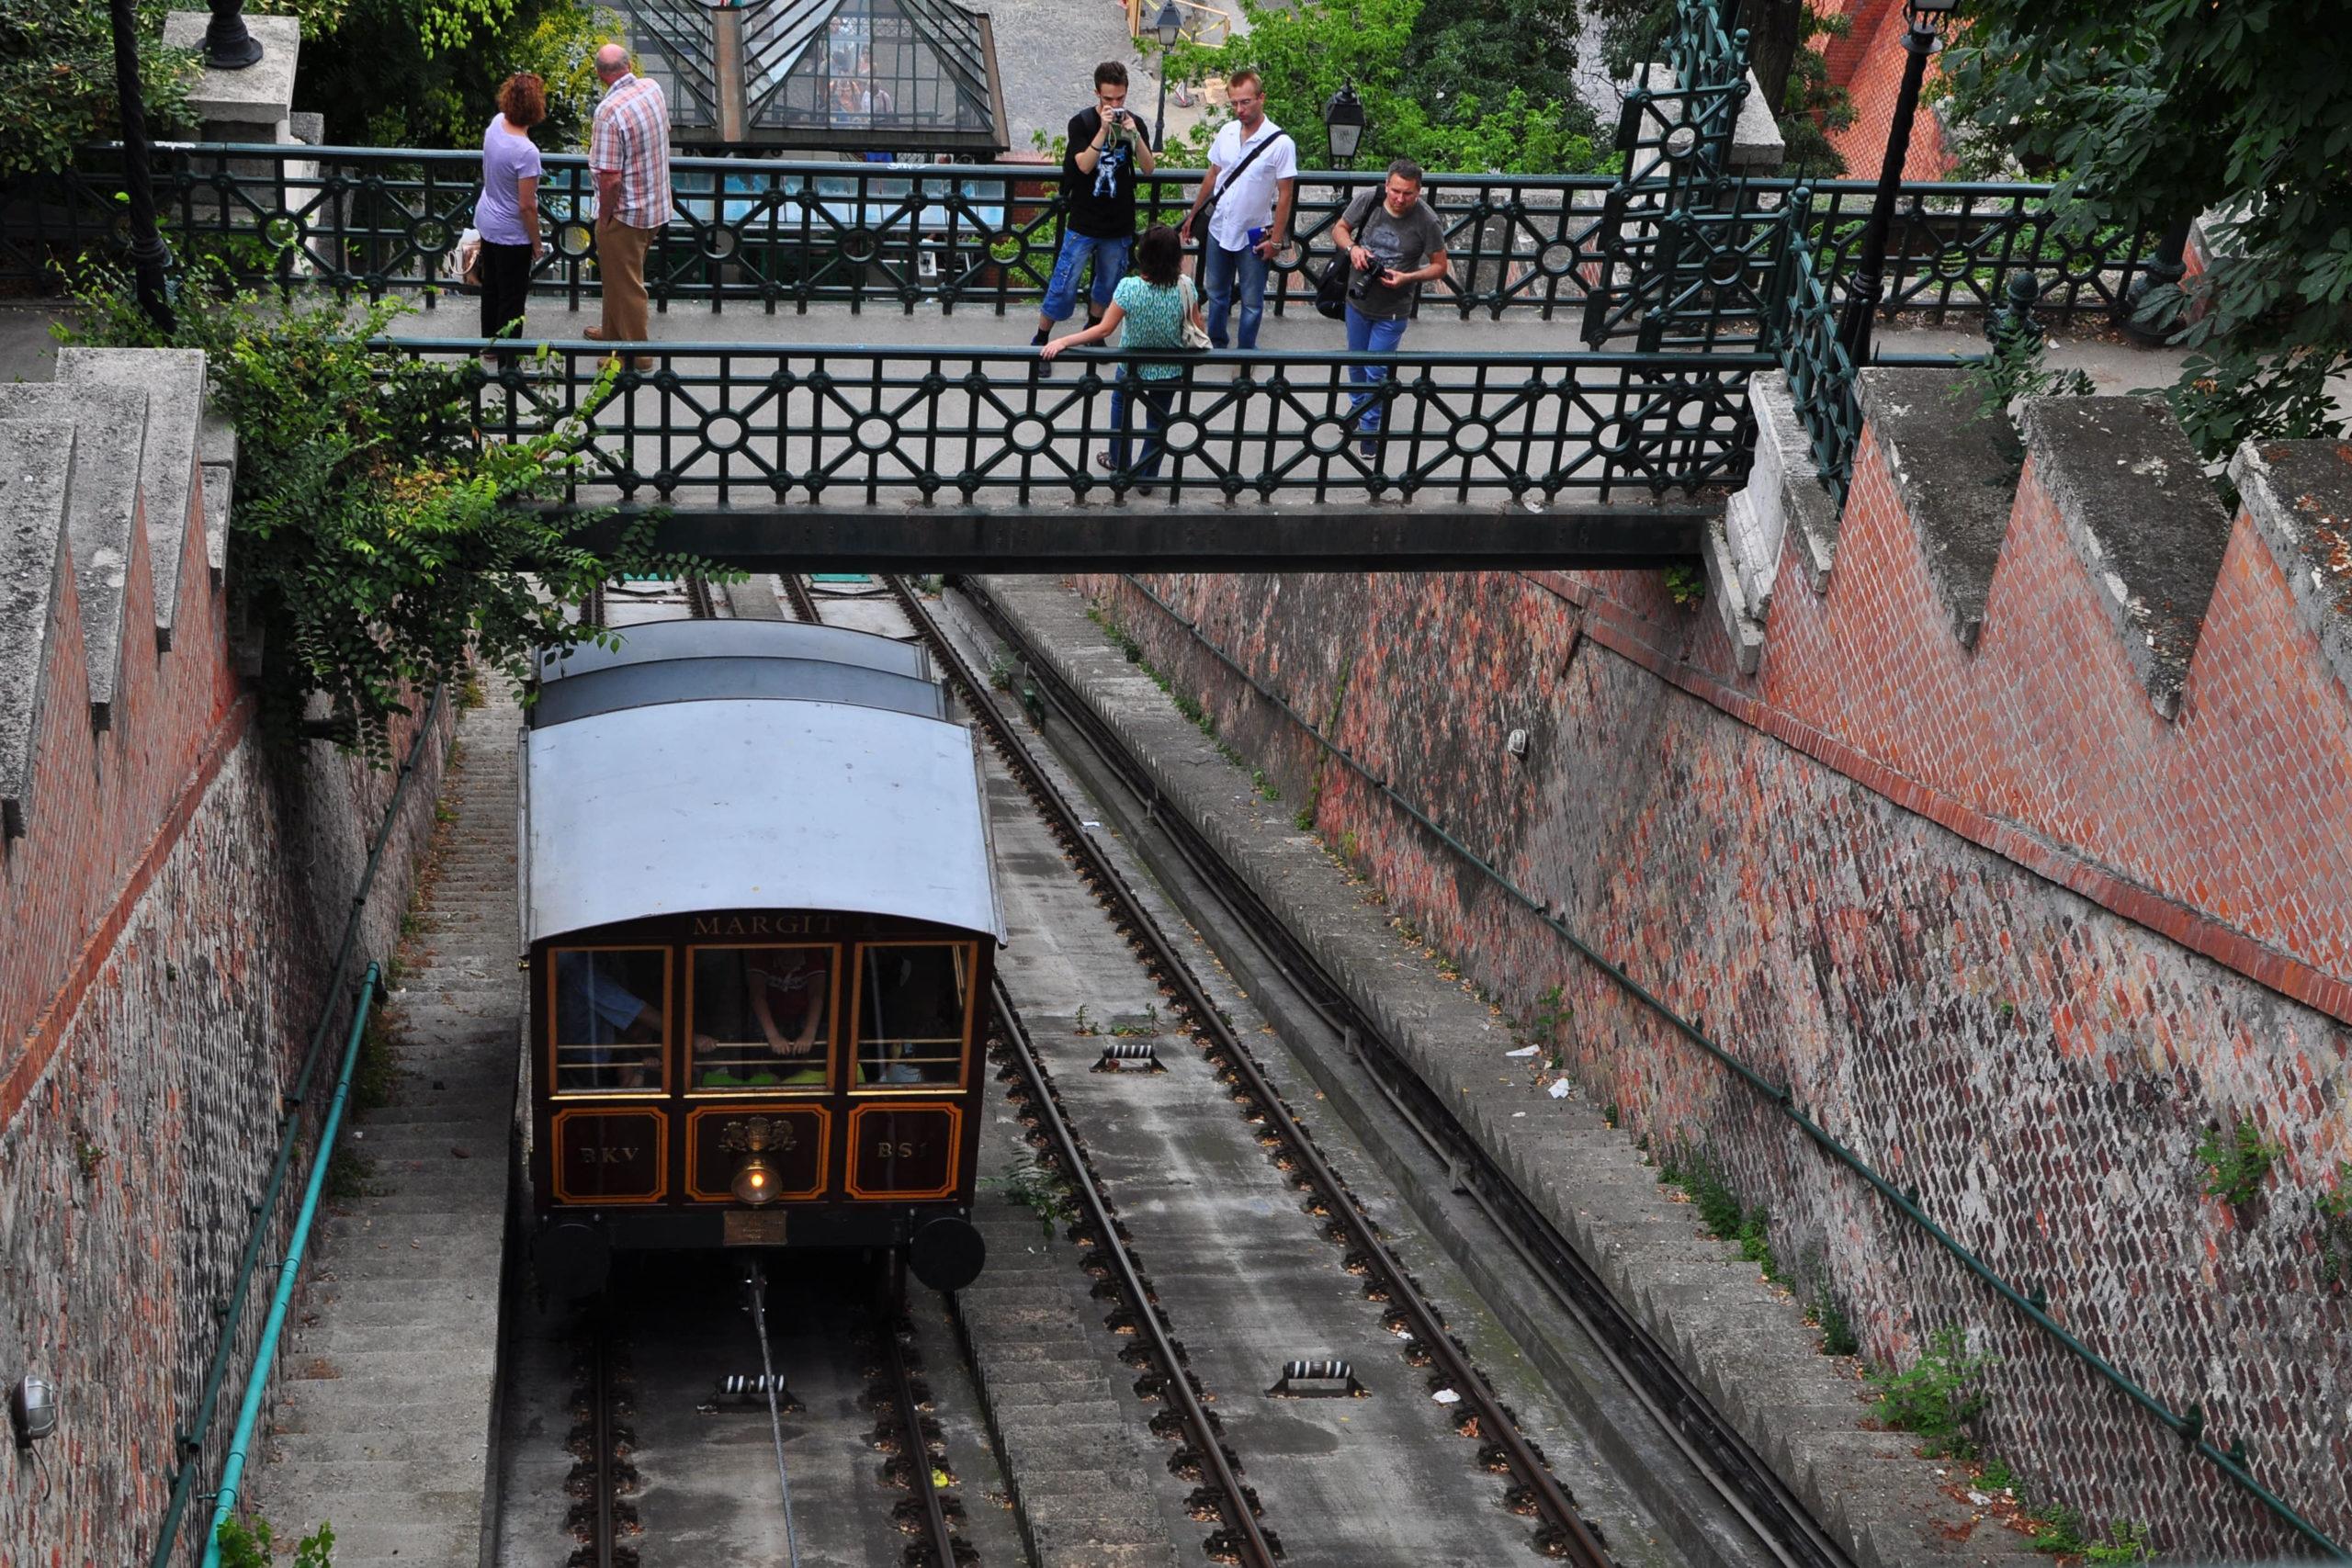 Rail transport - Rapid transit